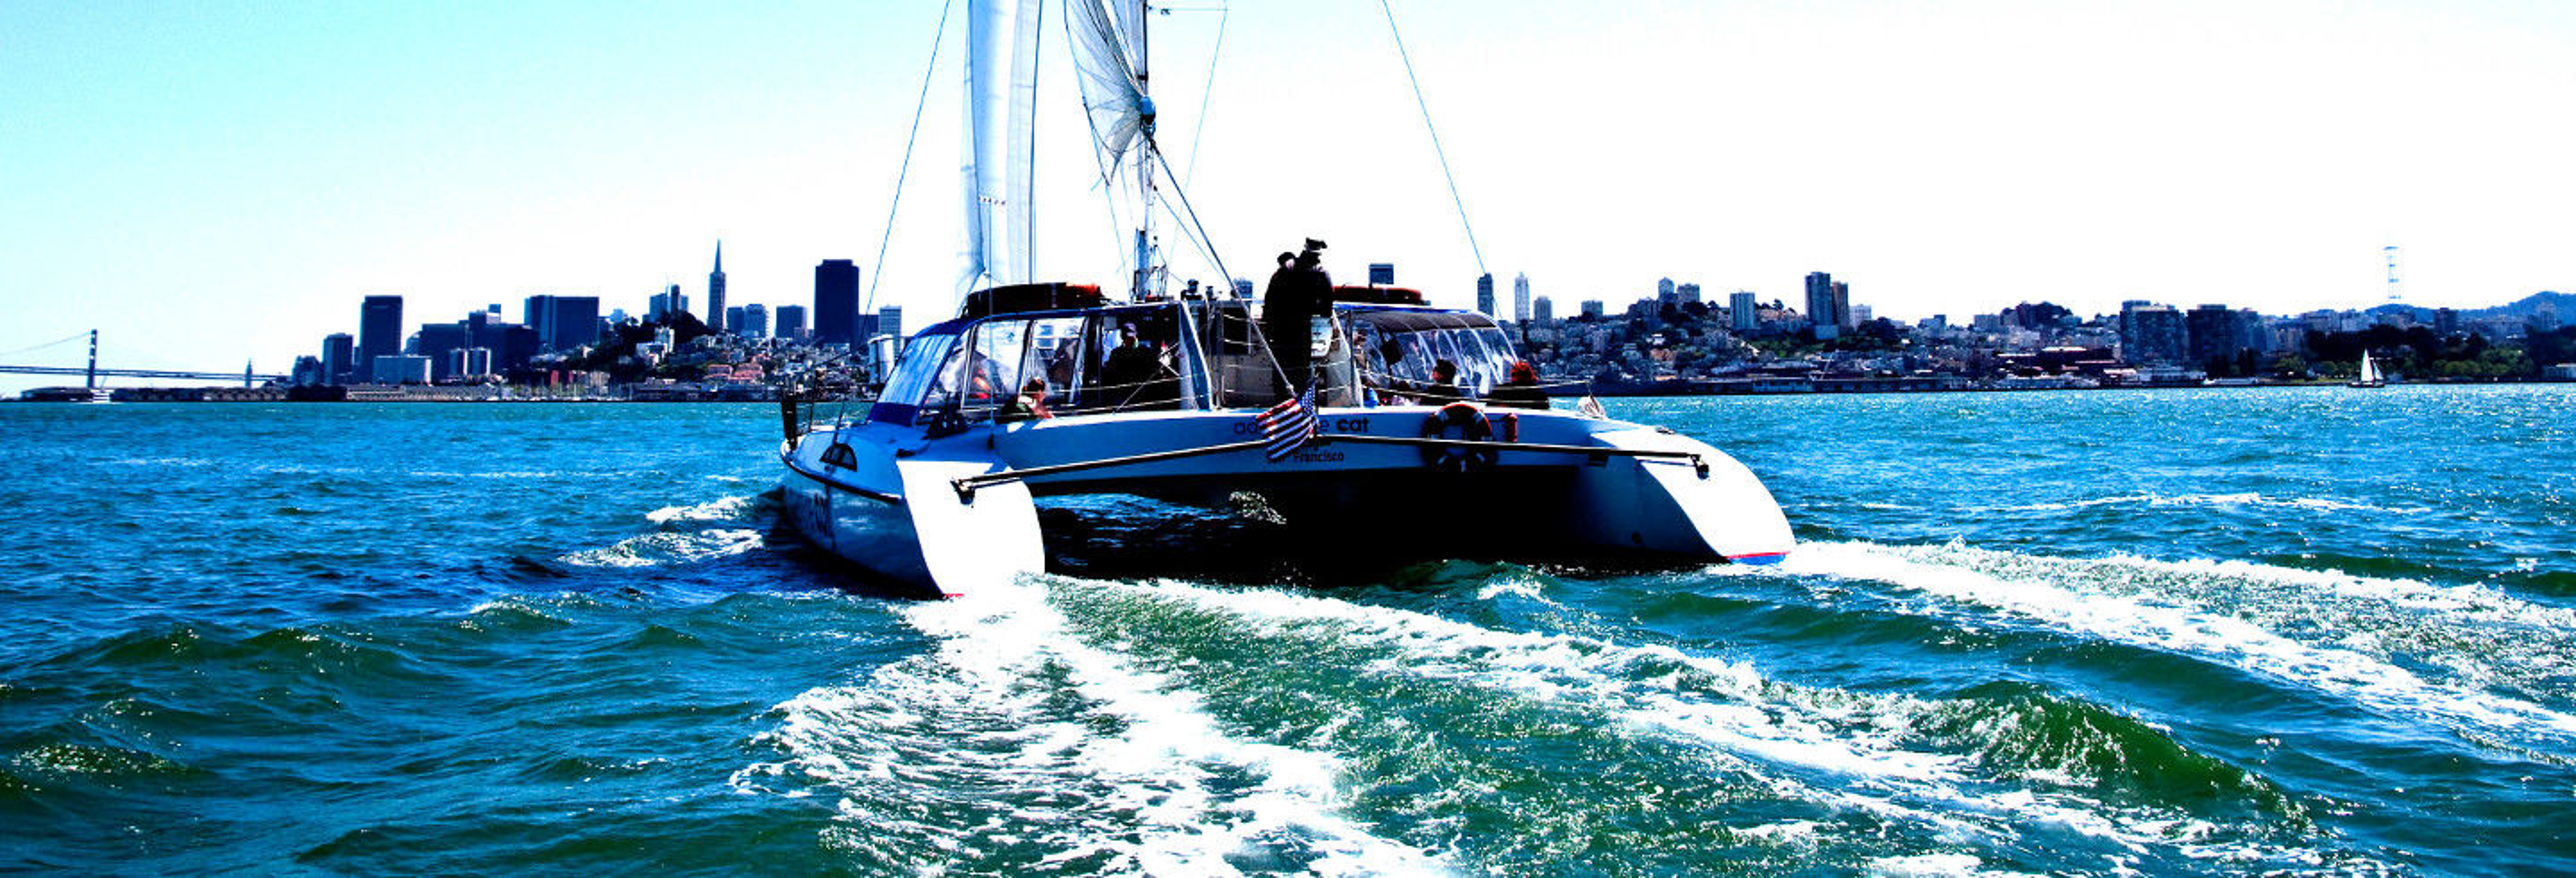 Giro in catamarano nella baia San Francisco